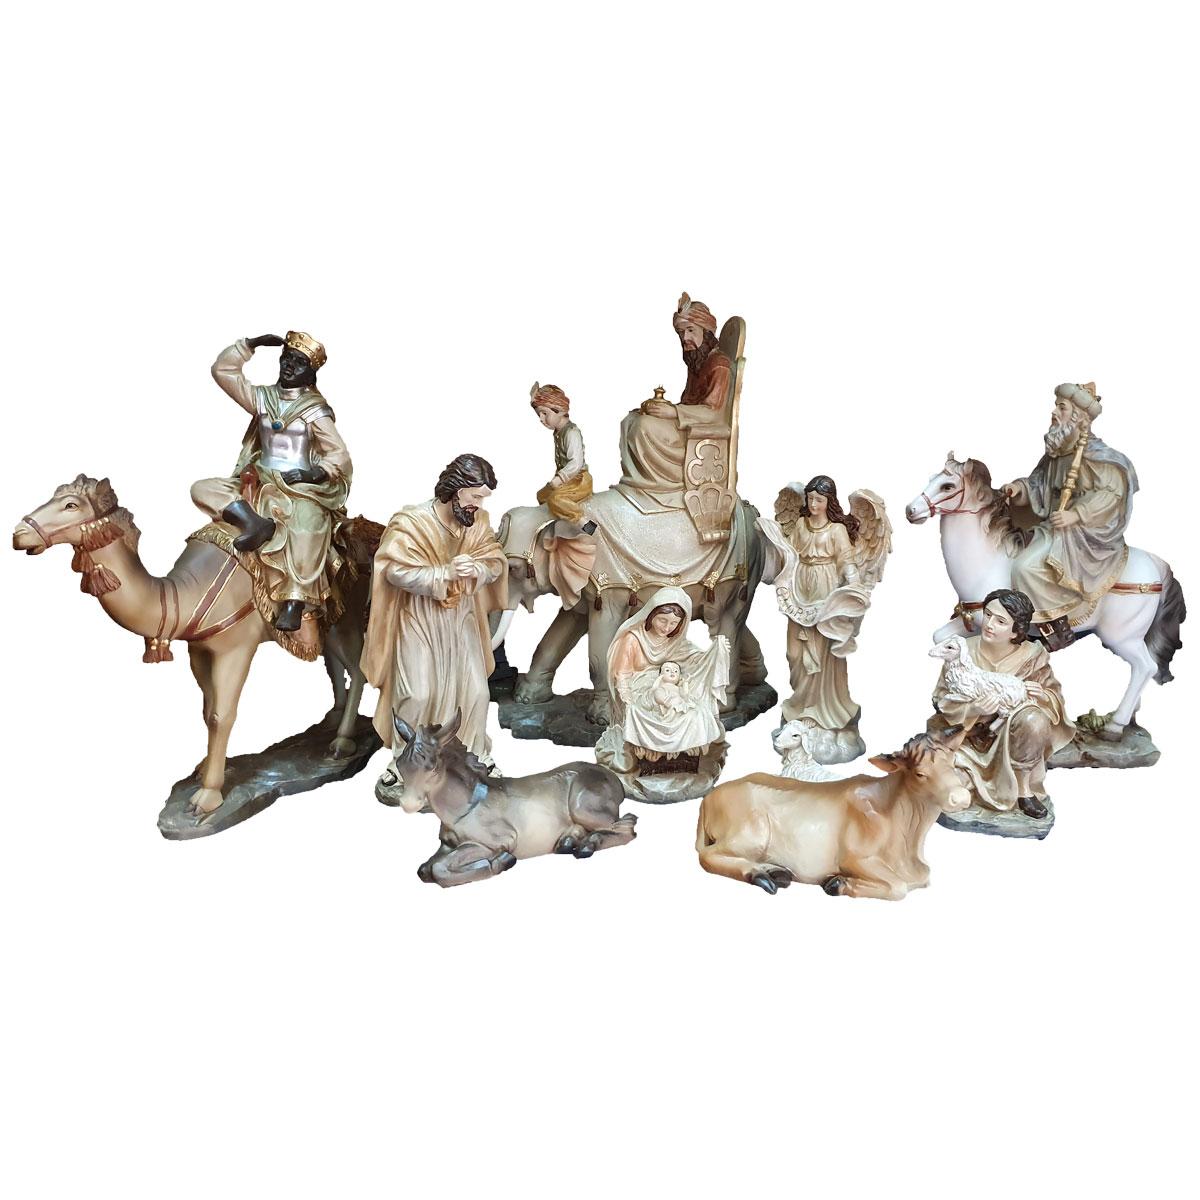 10pc Nativity Scene (CHR1-042)